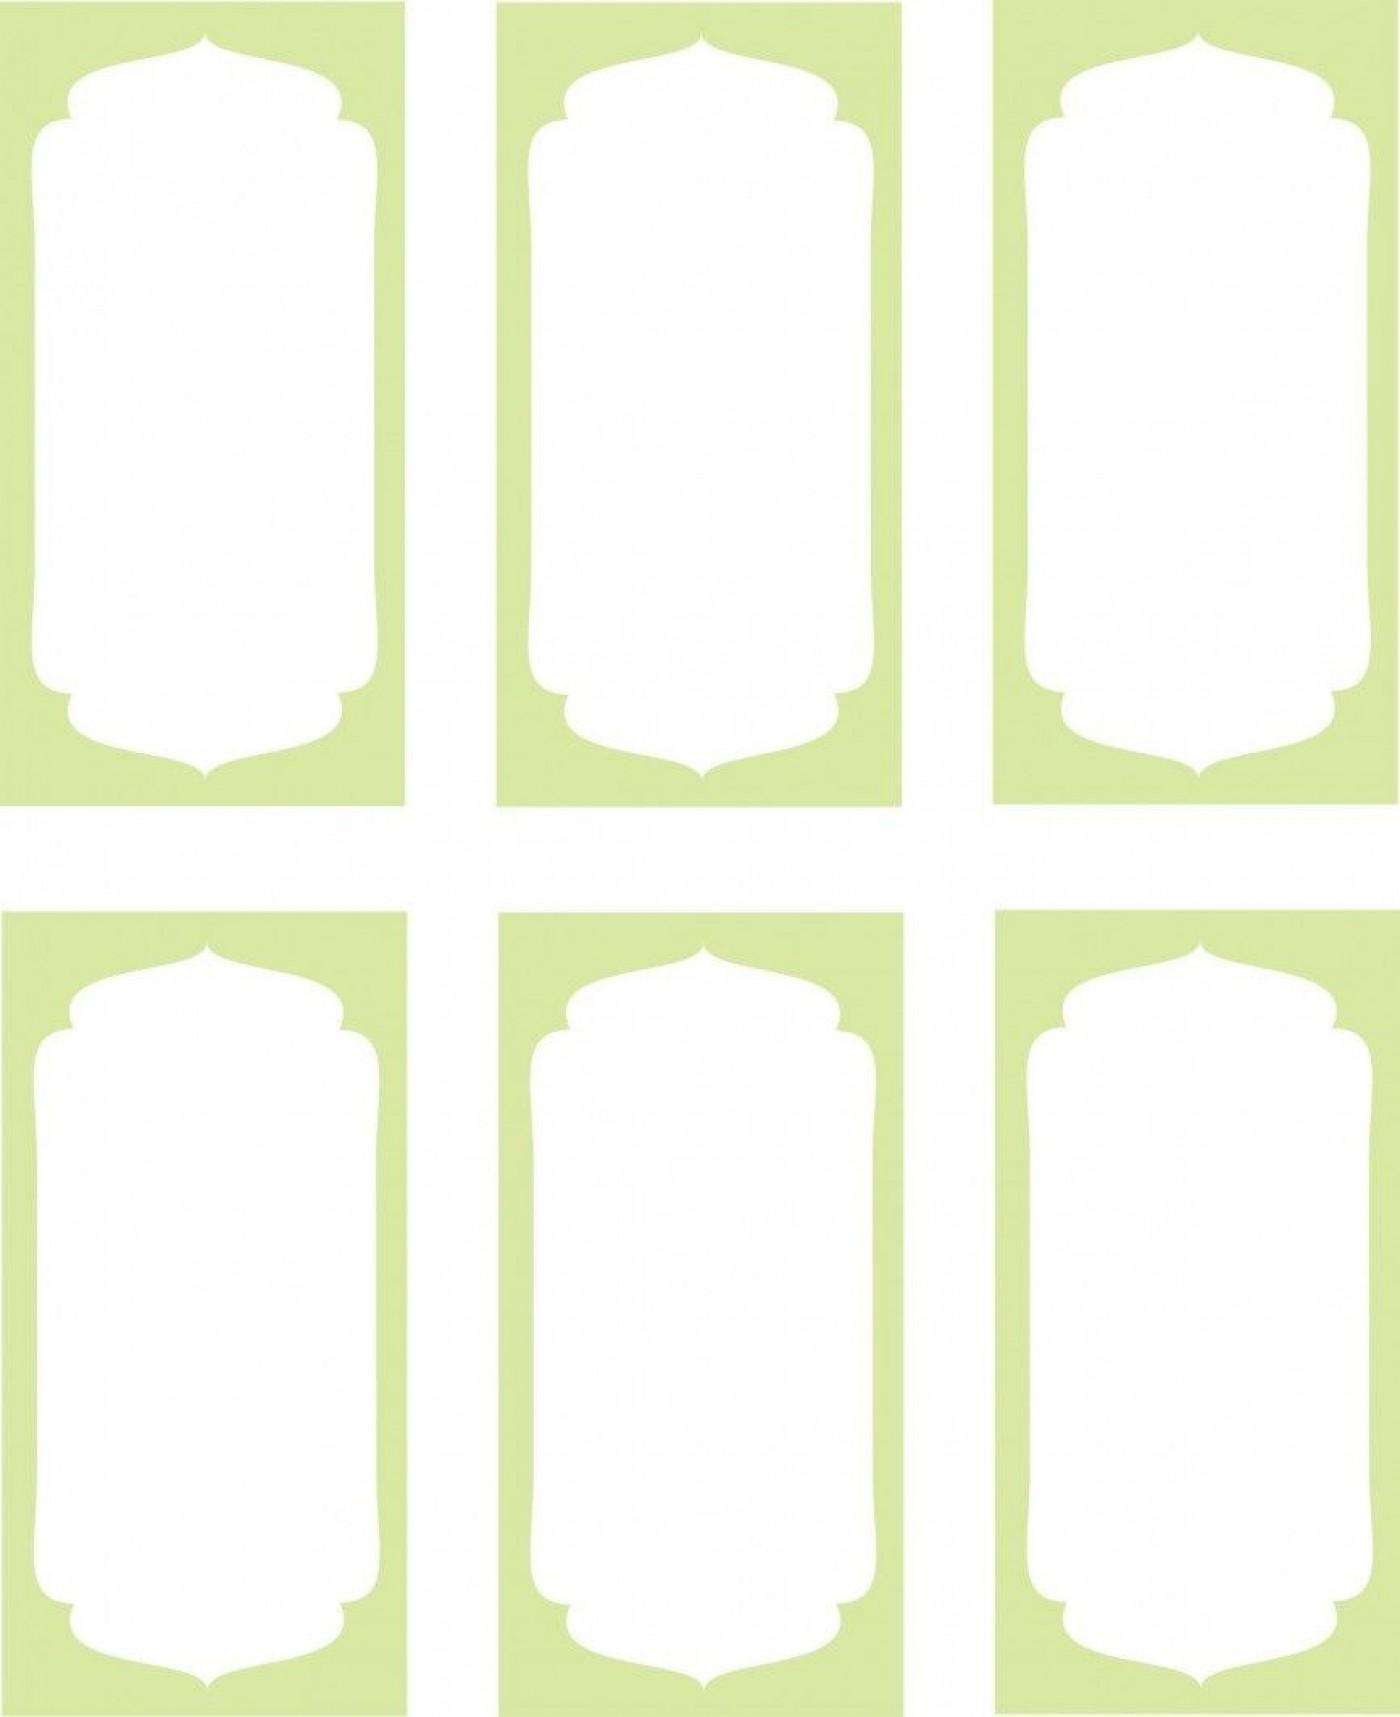 009 Stunning Free Return Addres Label Template 60 Per Sheet High Definition 1400